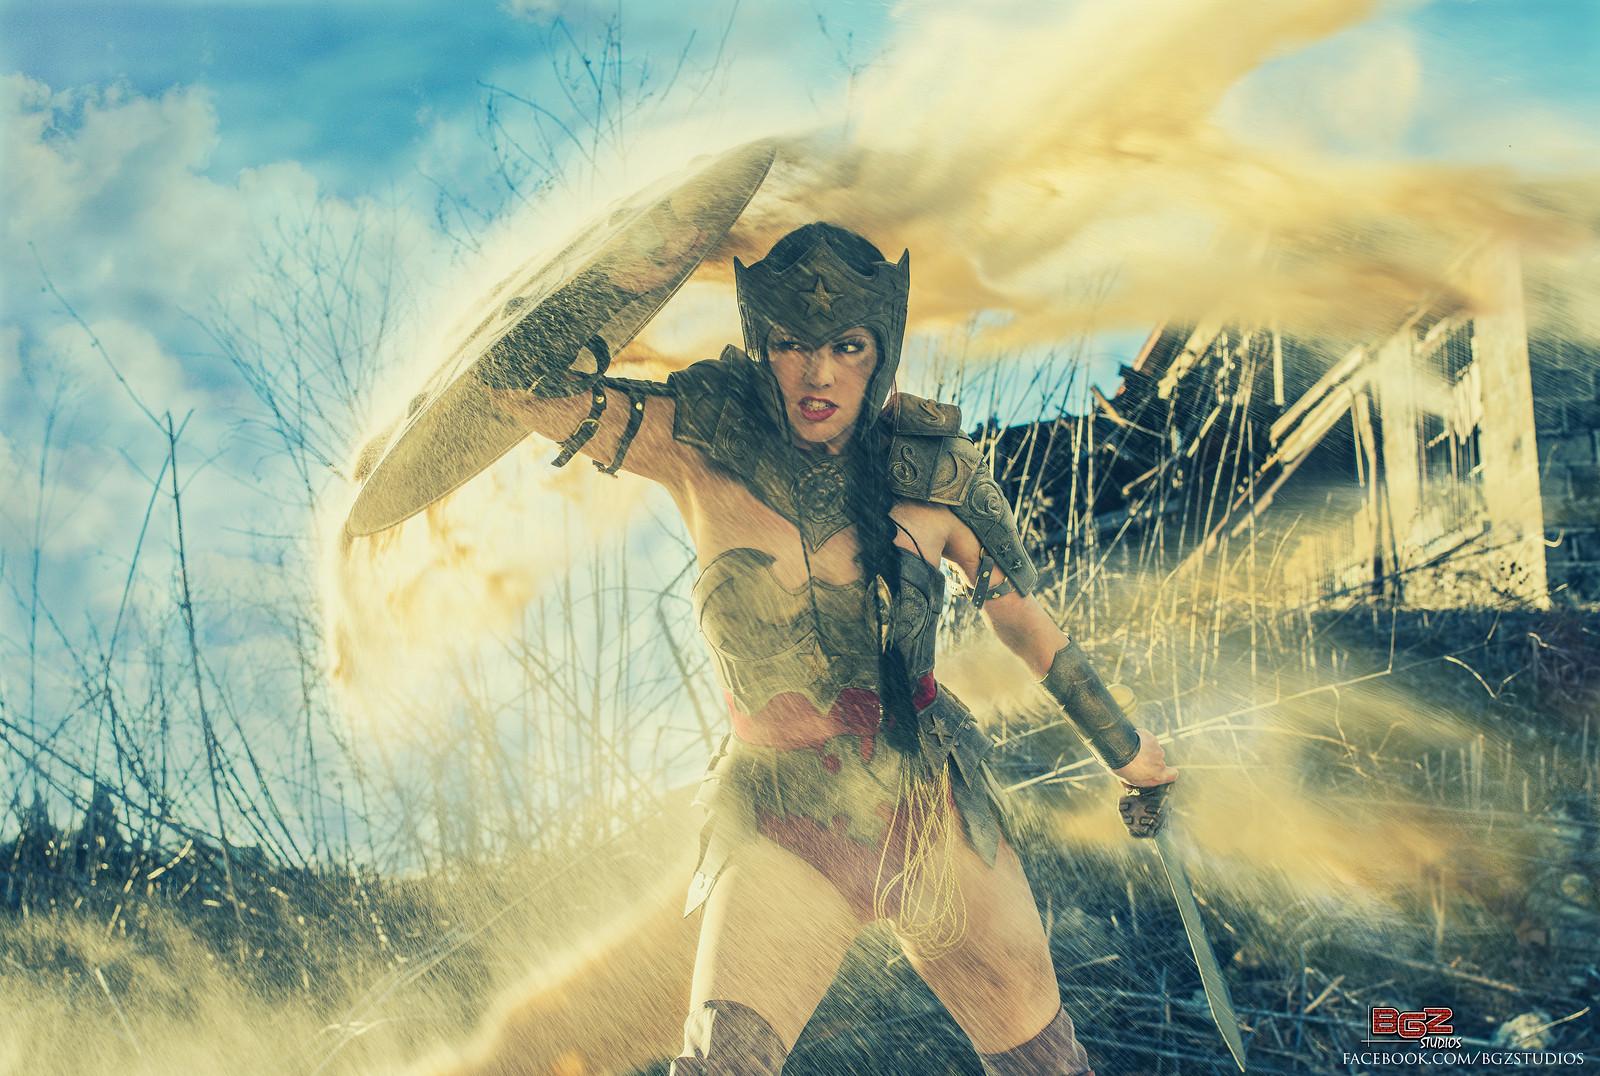 Miracole Burns  is Wonder Woman — Photo by  BGZ Studios